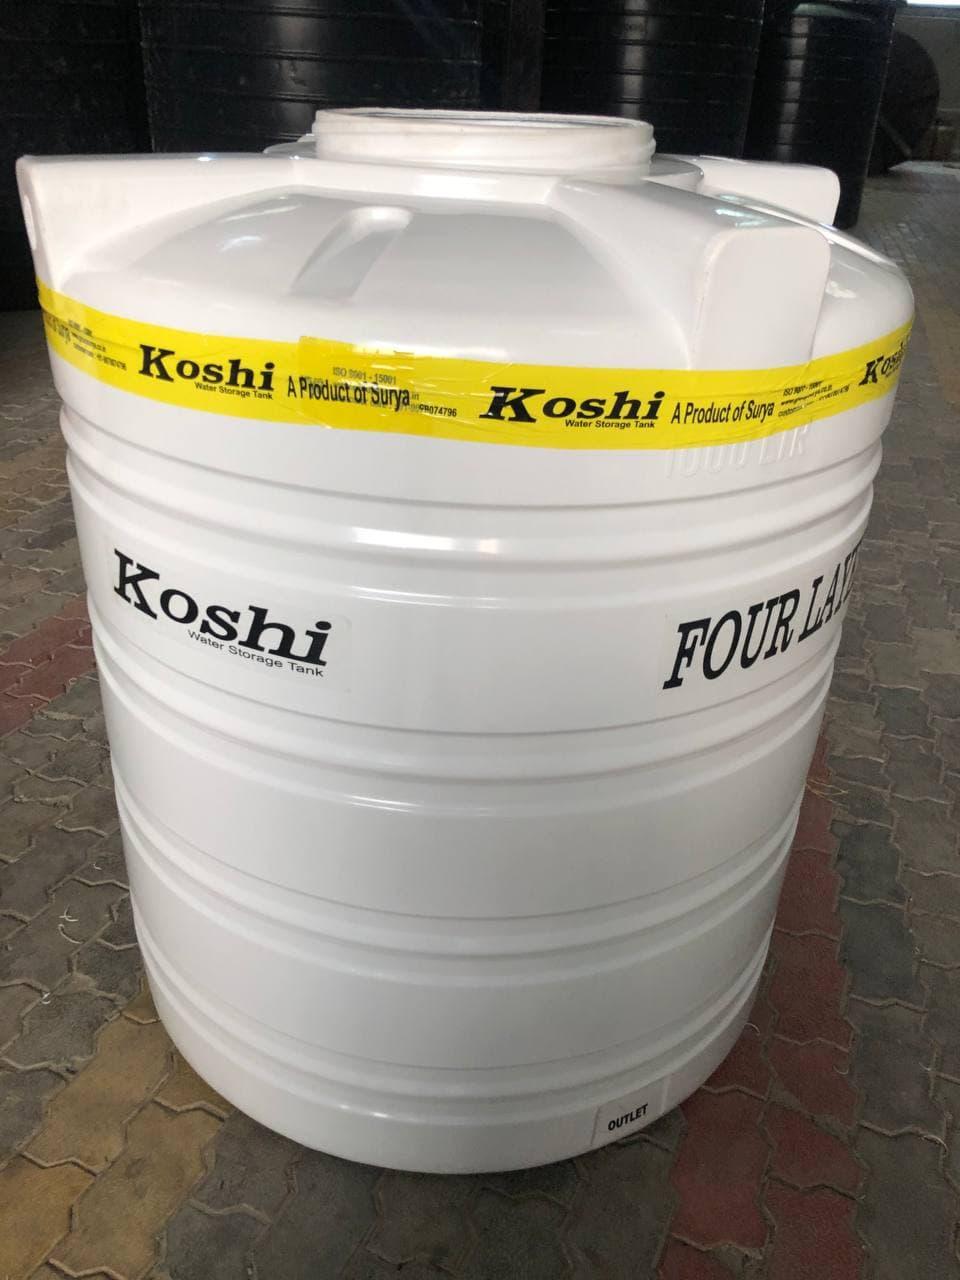 Koshiplast water storage tanks manufacturer (1000 ltr)